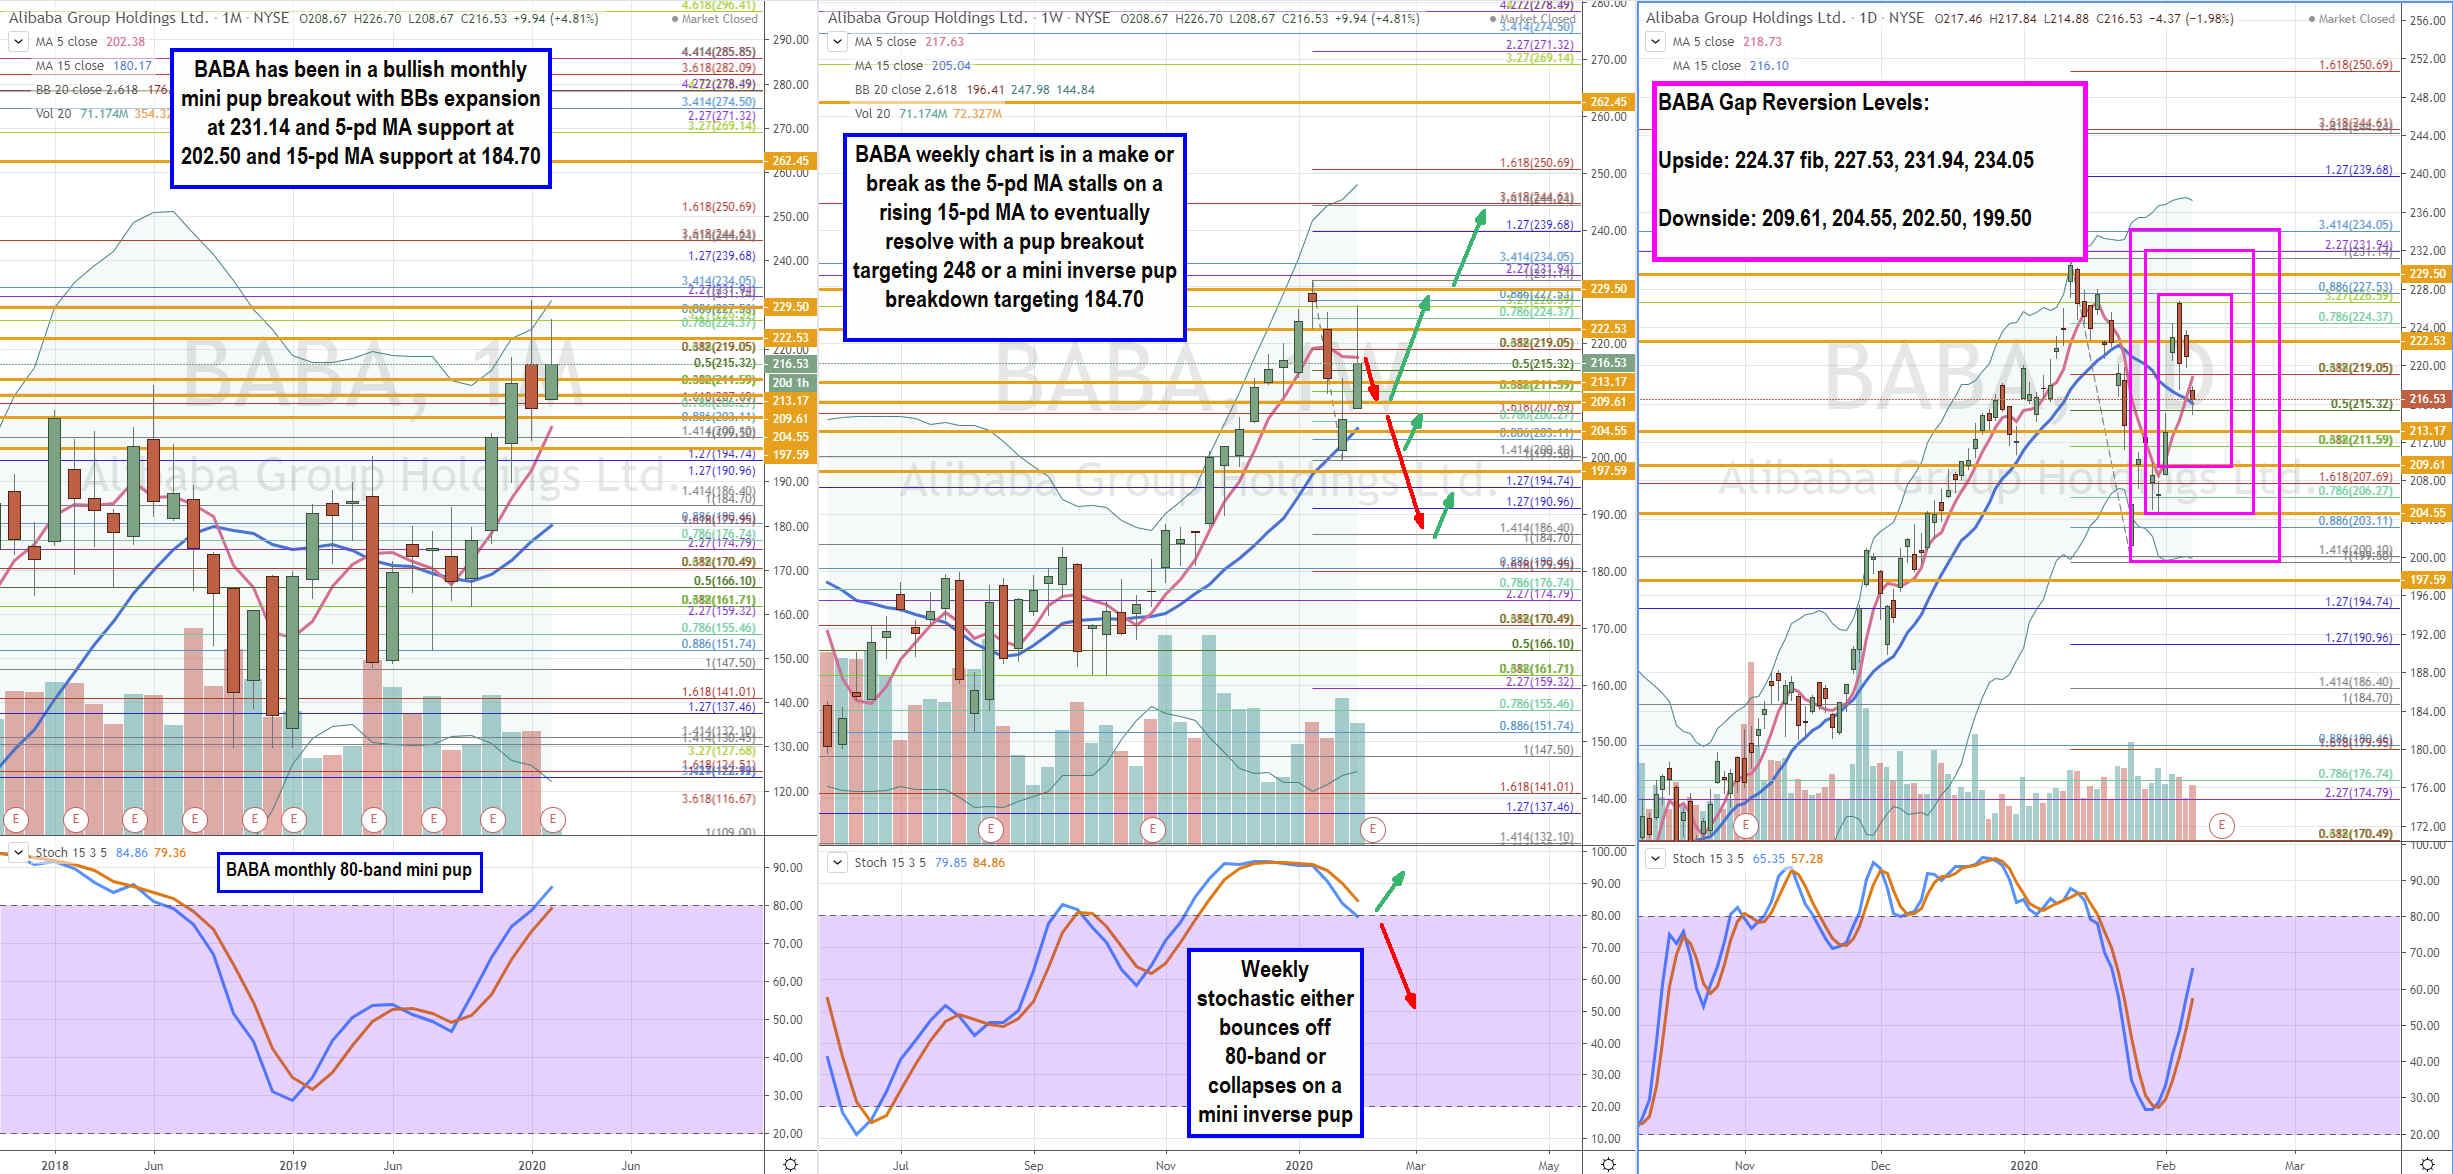 Trading Blueprint for Alibaba (BABA) Stock